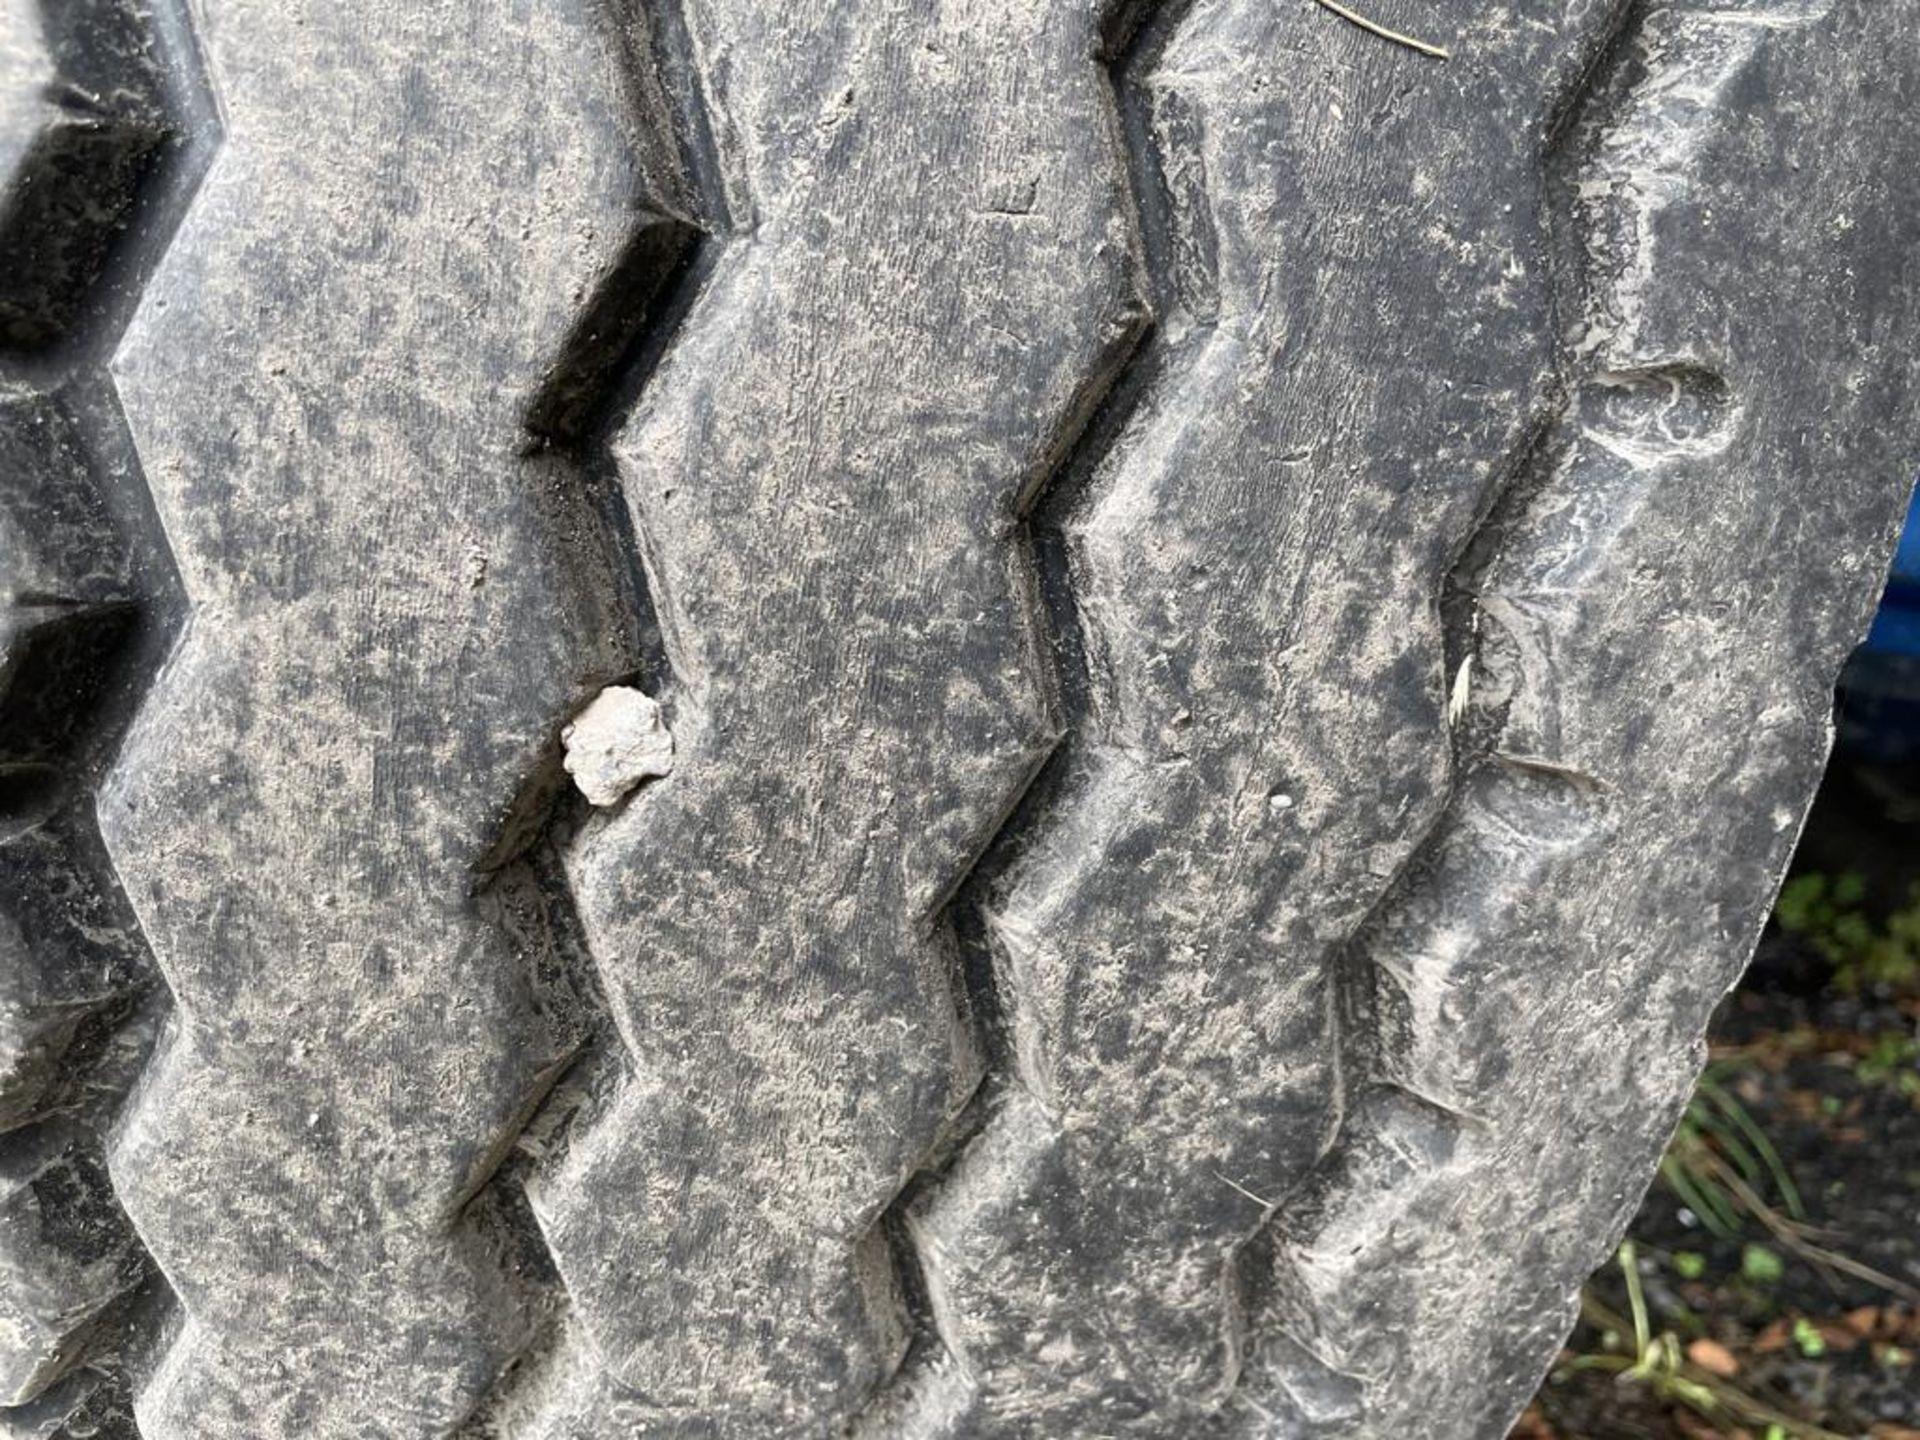 DENNISON TRI-AXLE 24,000KG HEAVY DUTY FLAT SEMI TRAILER, VIN no. SGKFL25PTHL050715, year of - Image 6 of 10